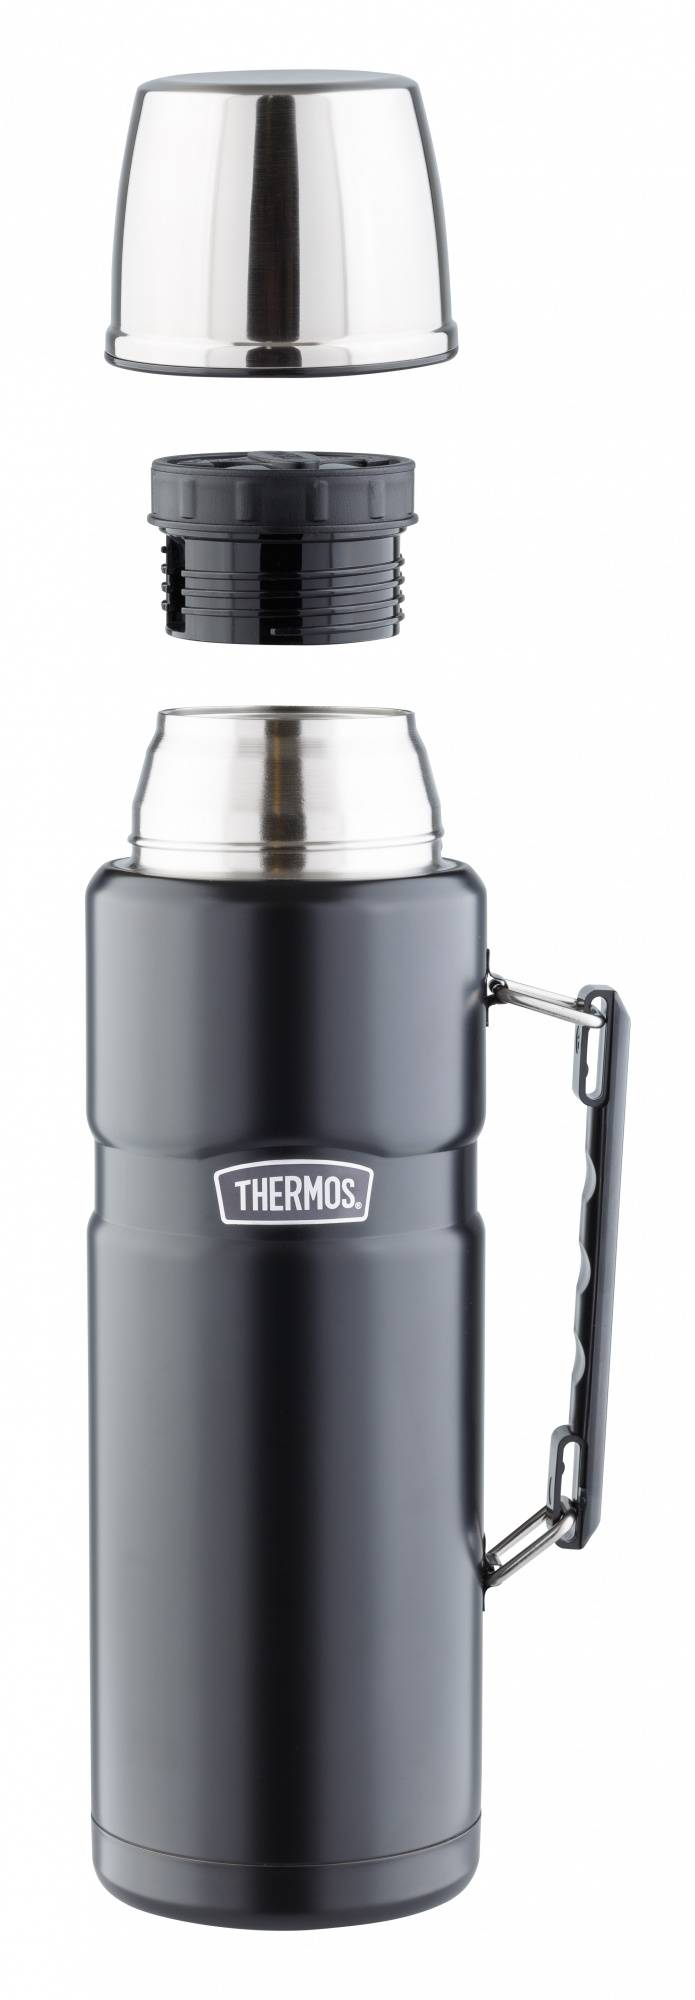 Термос Thermos SK2020 Matte Black черный (892195) - фото 2